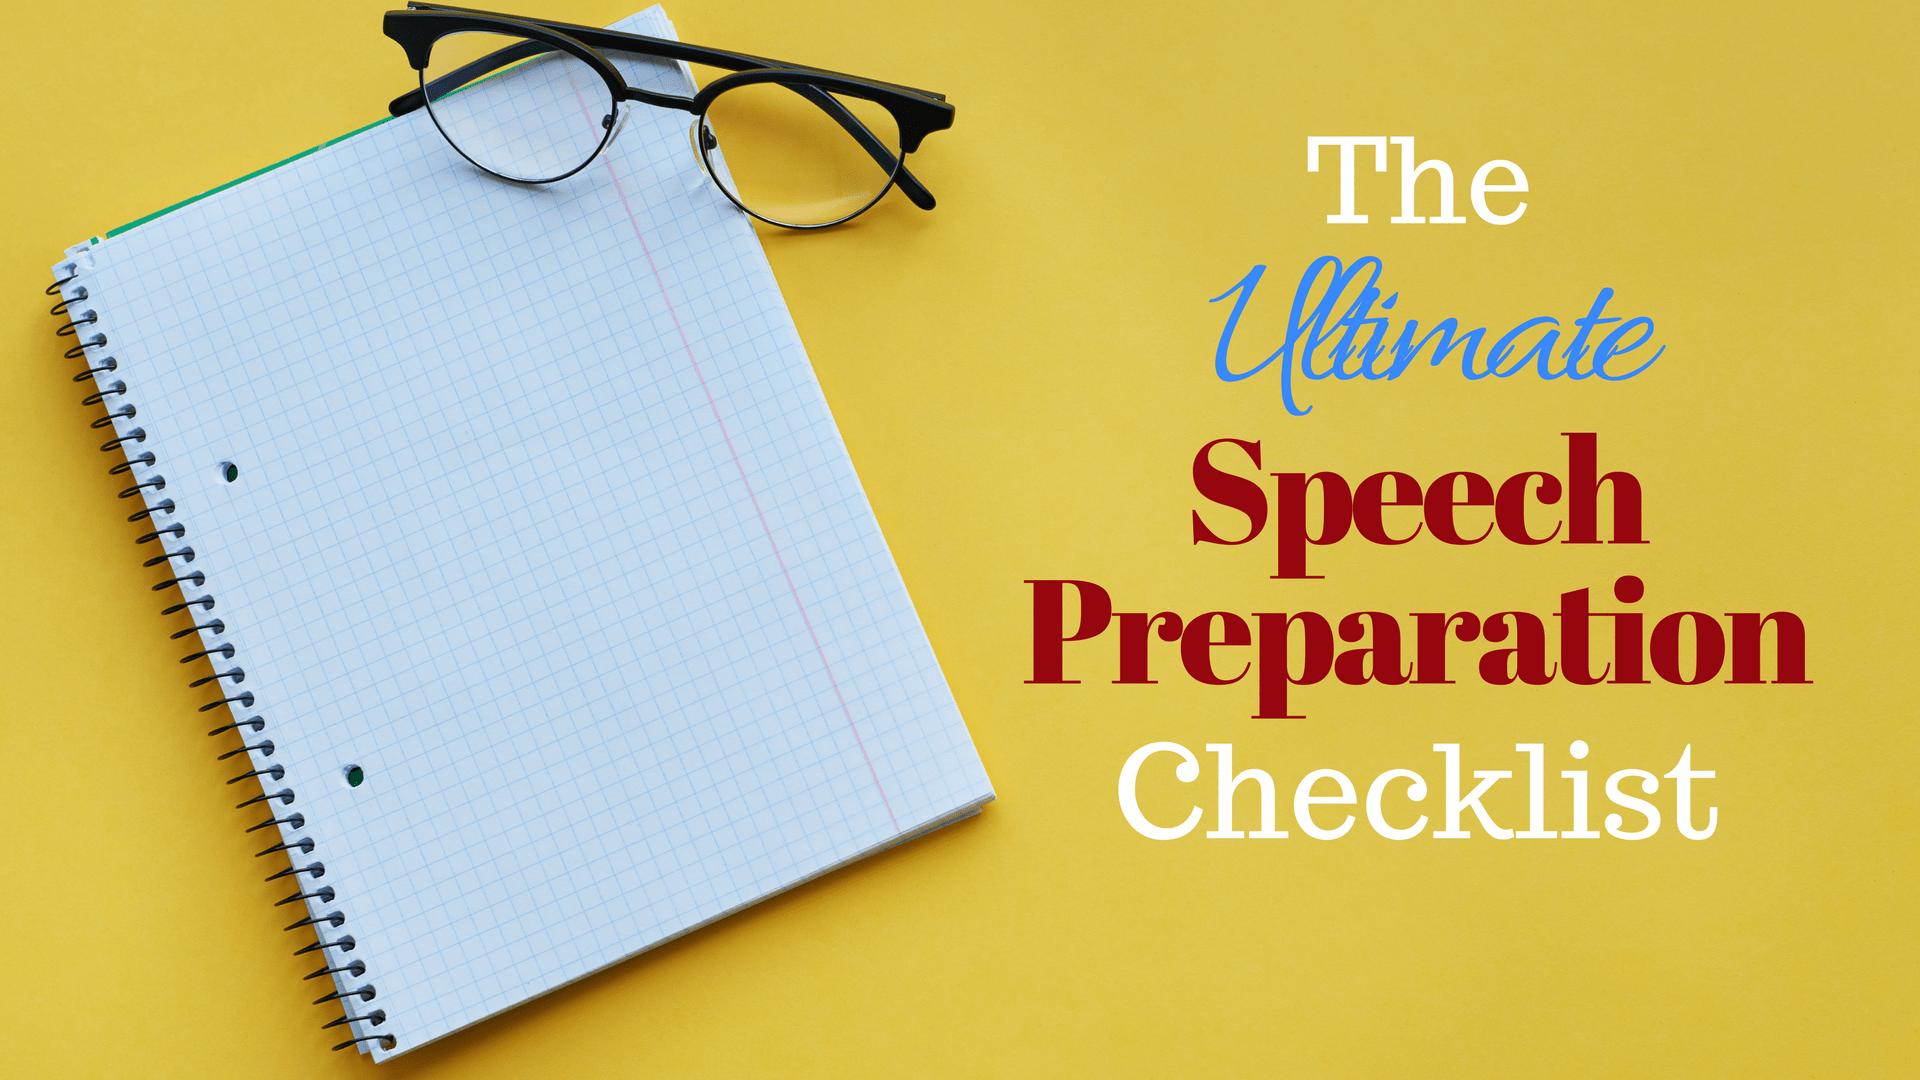 the ultimate speech preparation checklist for public speaking